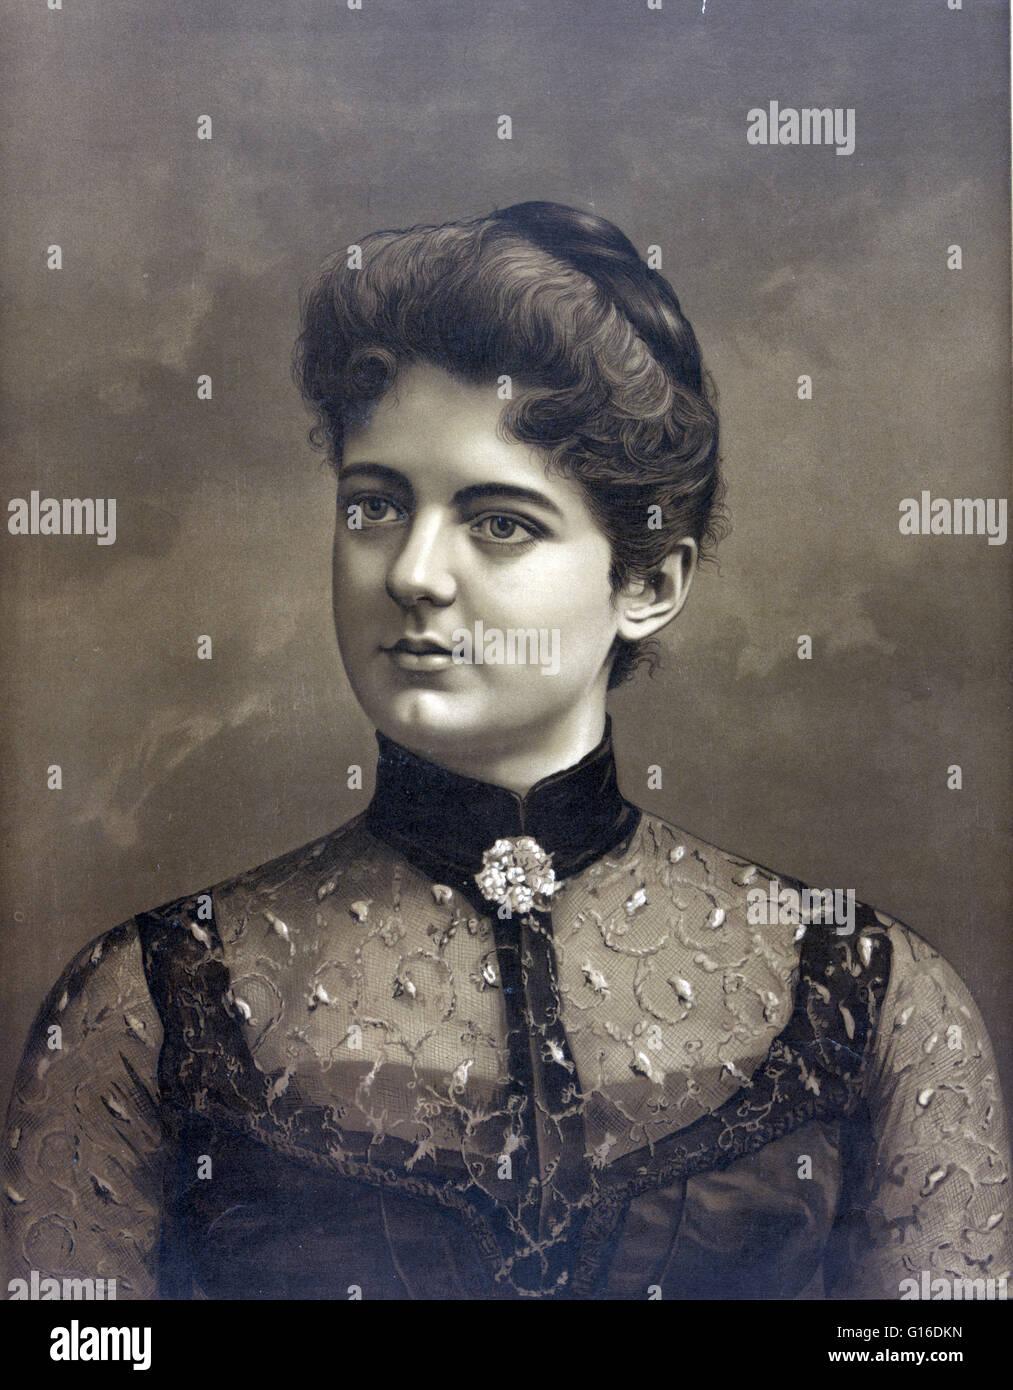 Frances Clara Folsom Cleveland Preston July 21 1864